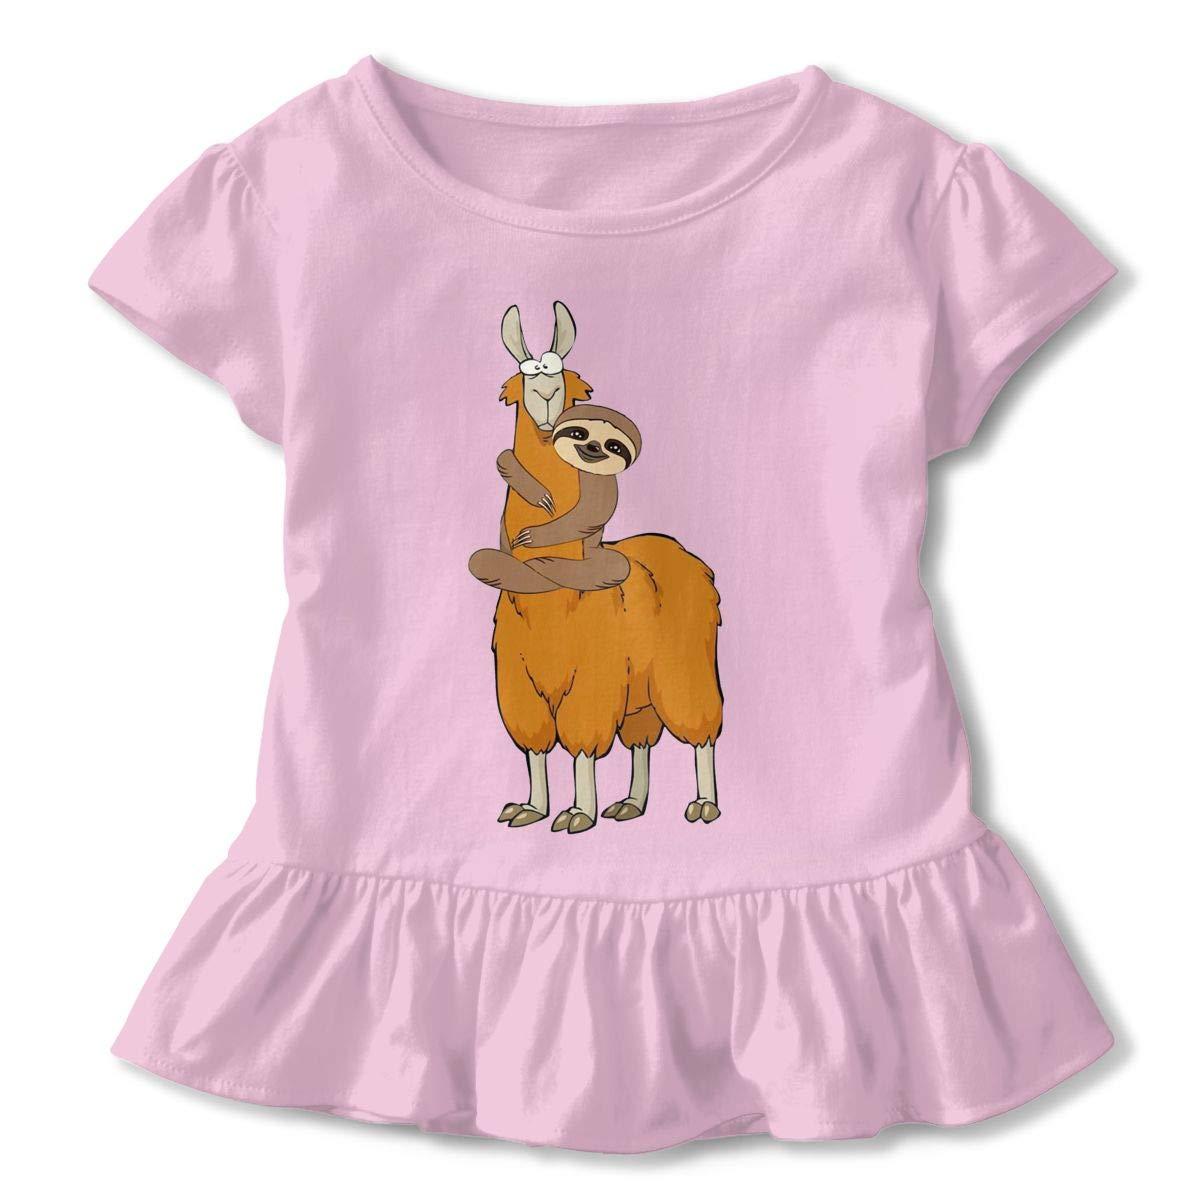 NMDJC CCQ Sloth Riding Llama Baby Skirts Cute Kids T Shirt Dress Short Sleeve Flounces Costume